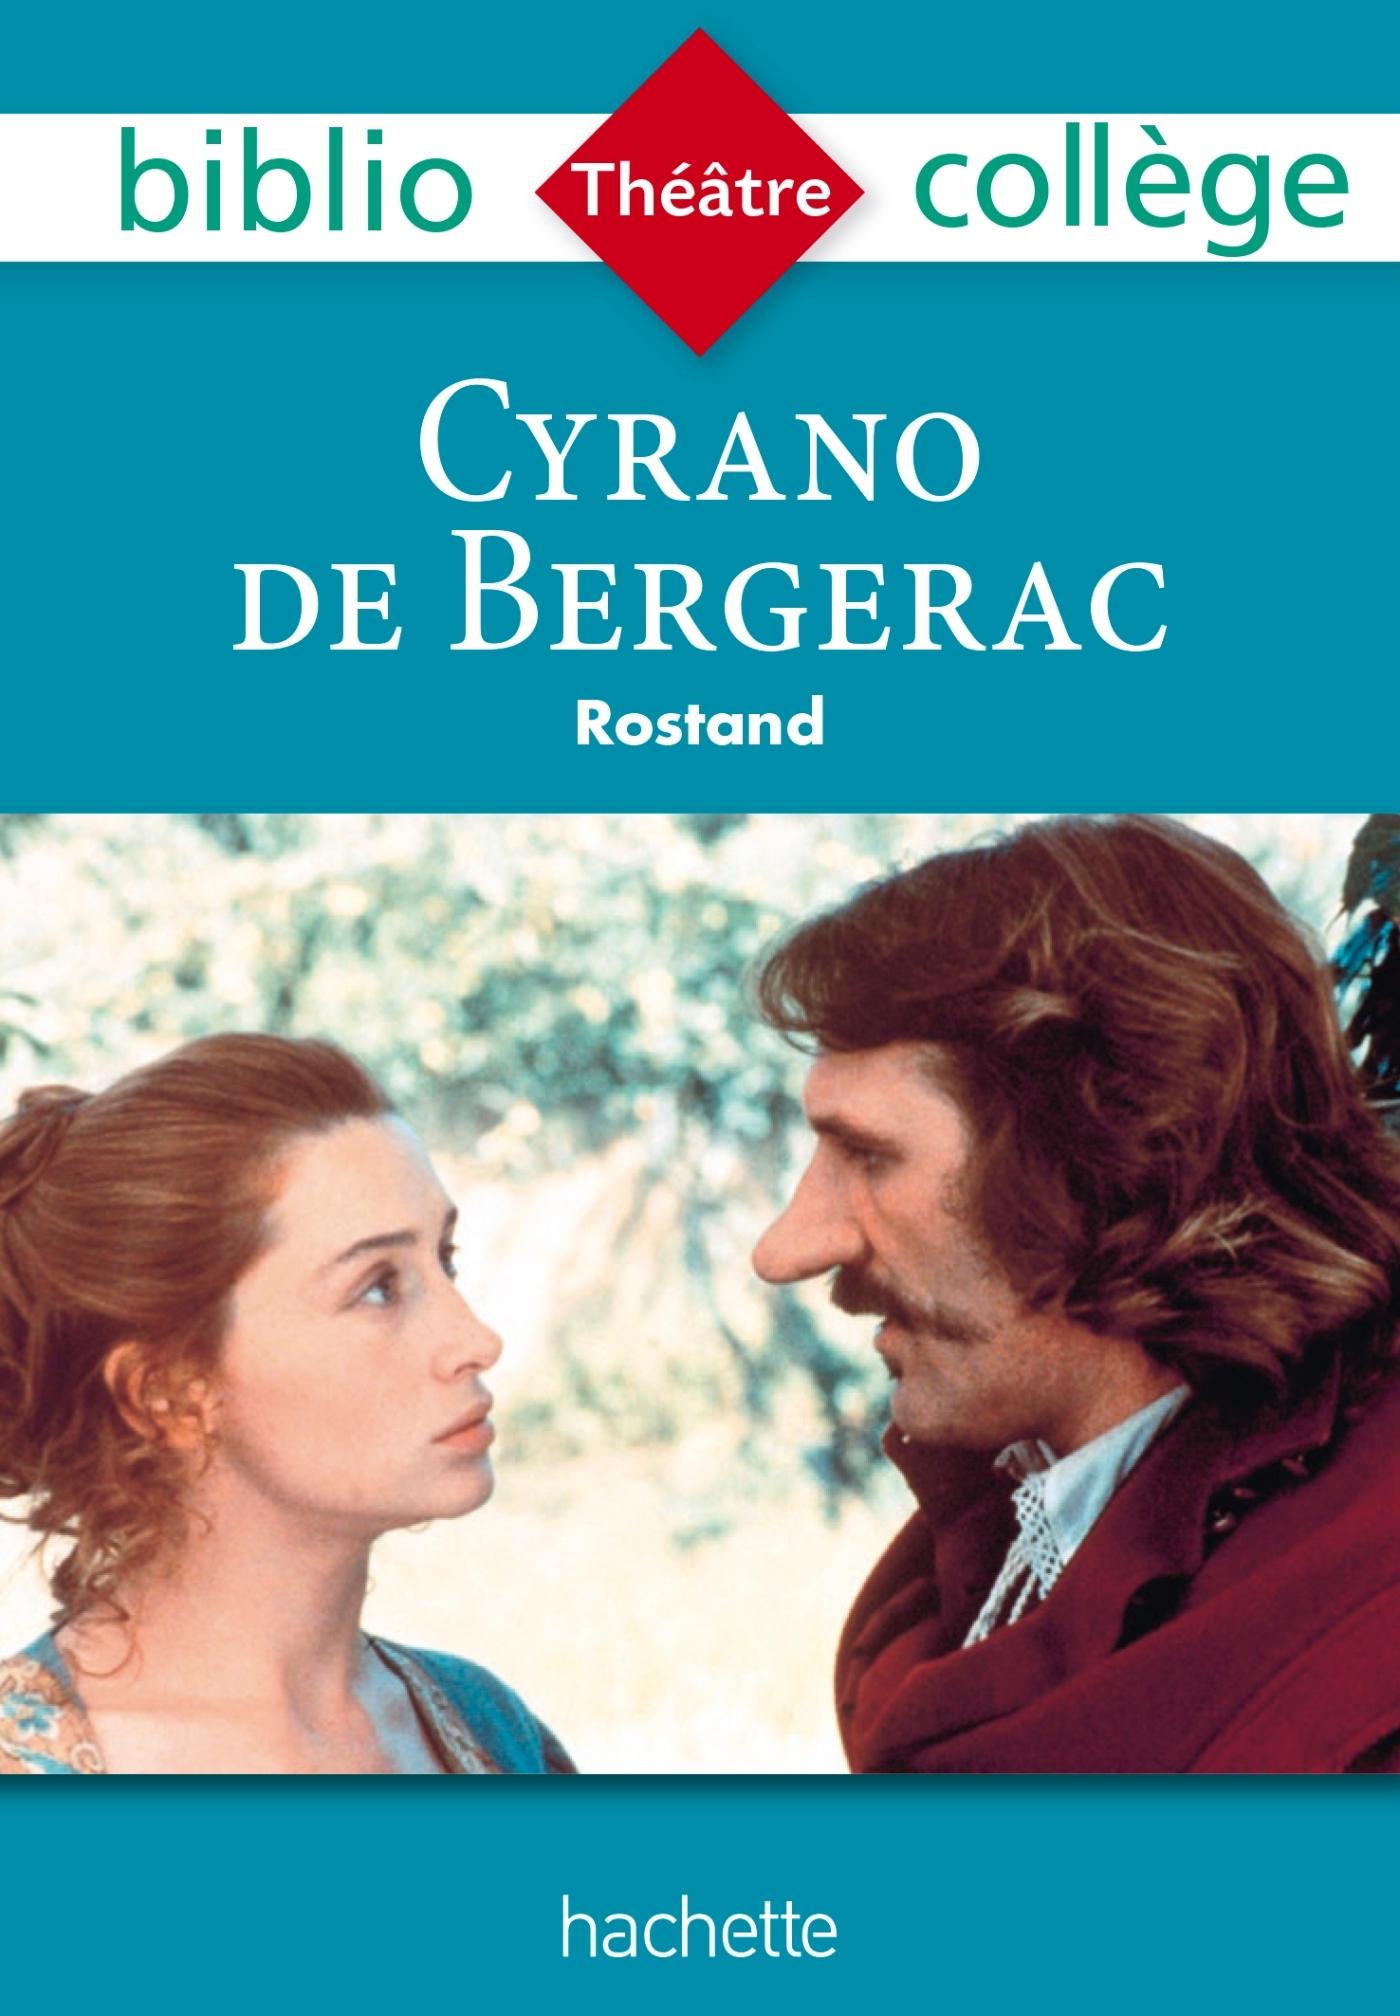 BIBLIOCOLLEGE- CYRANO DE BERGERAC, EDMOND ROSTAND